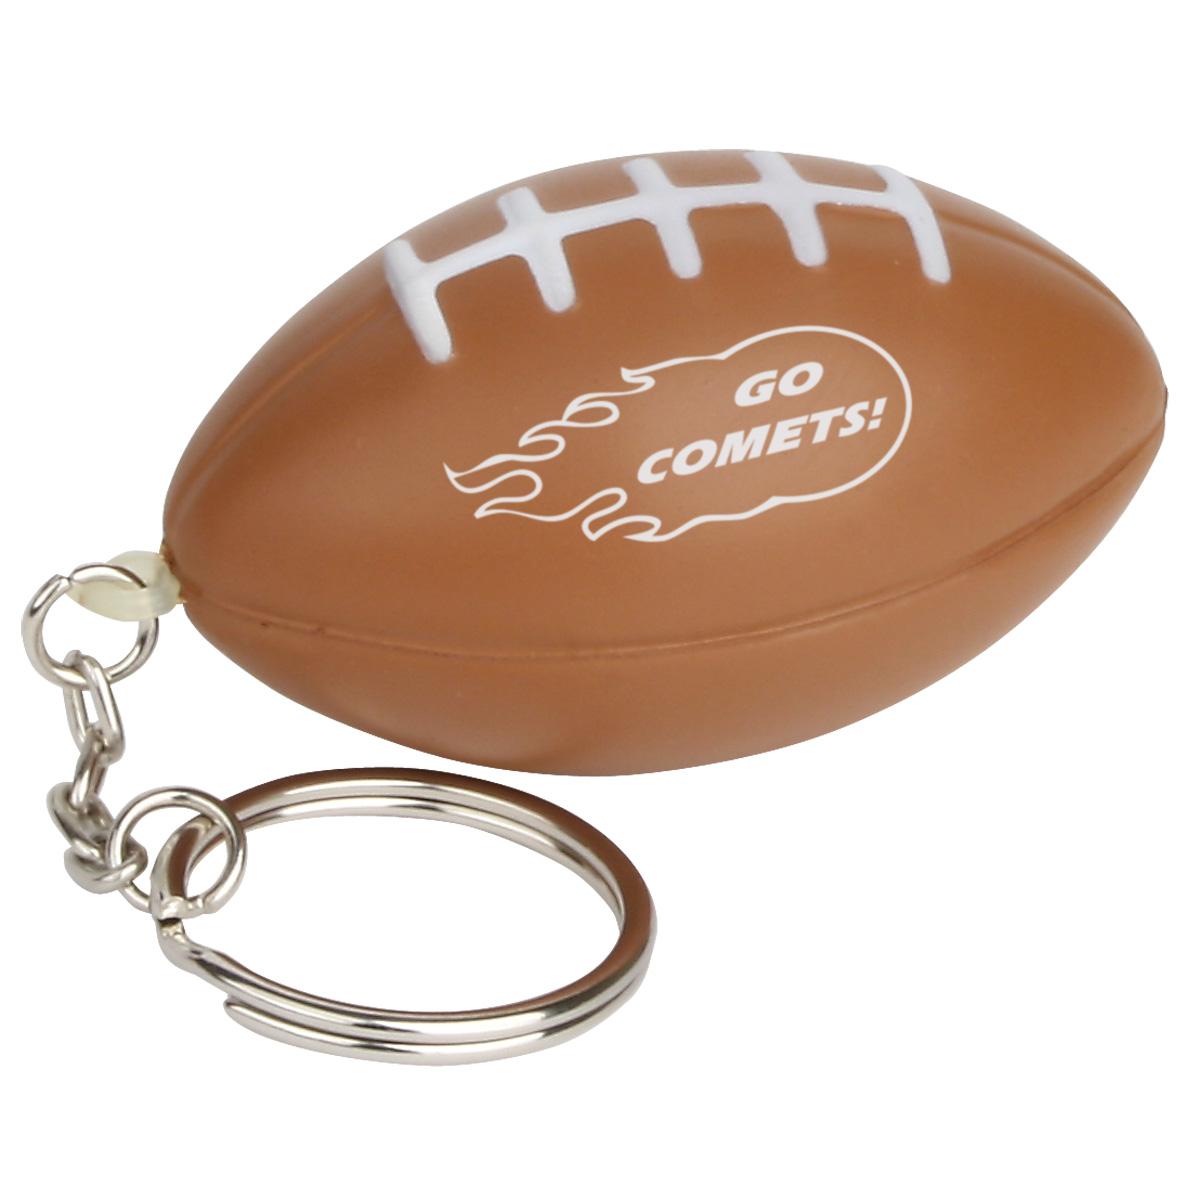 Football Stress Reliever Key Chain, LKC-FB03, 1 Colour Imprint